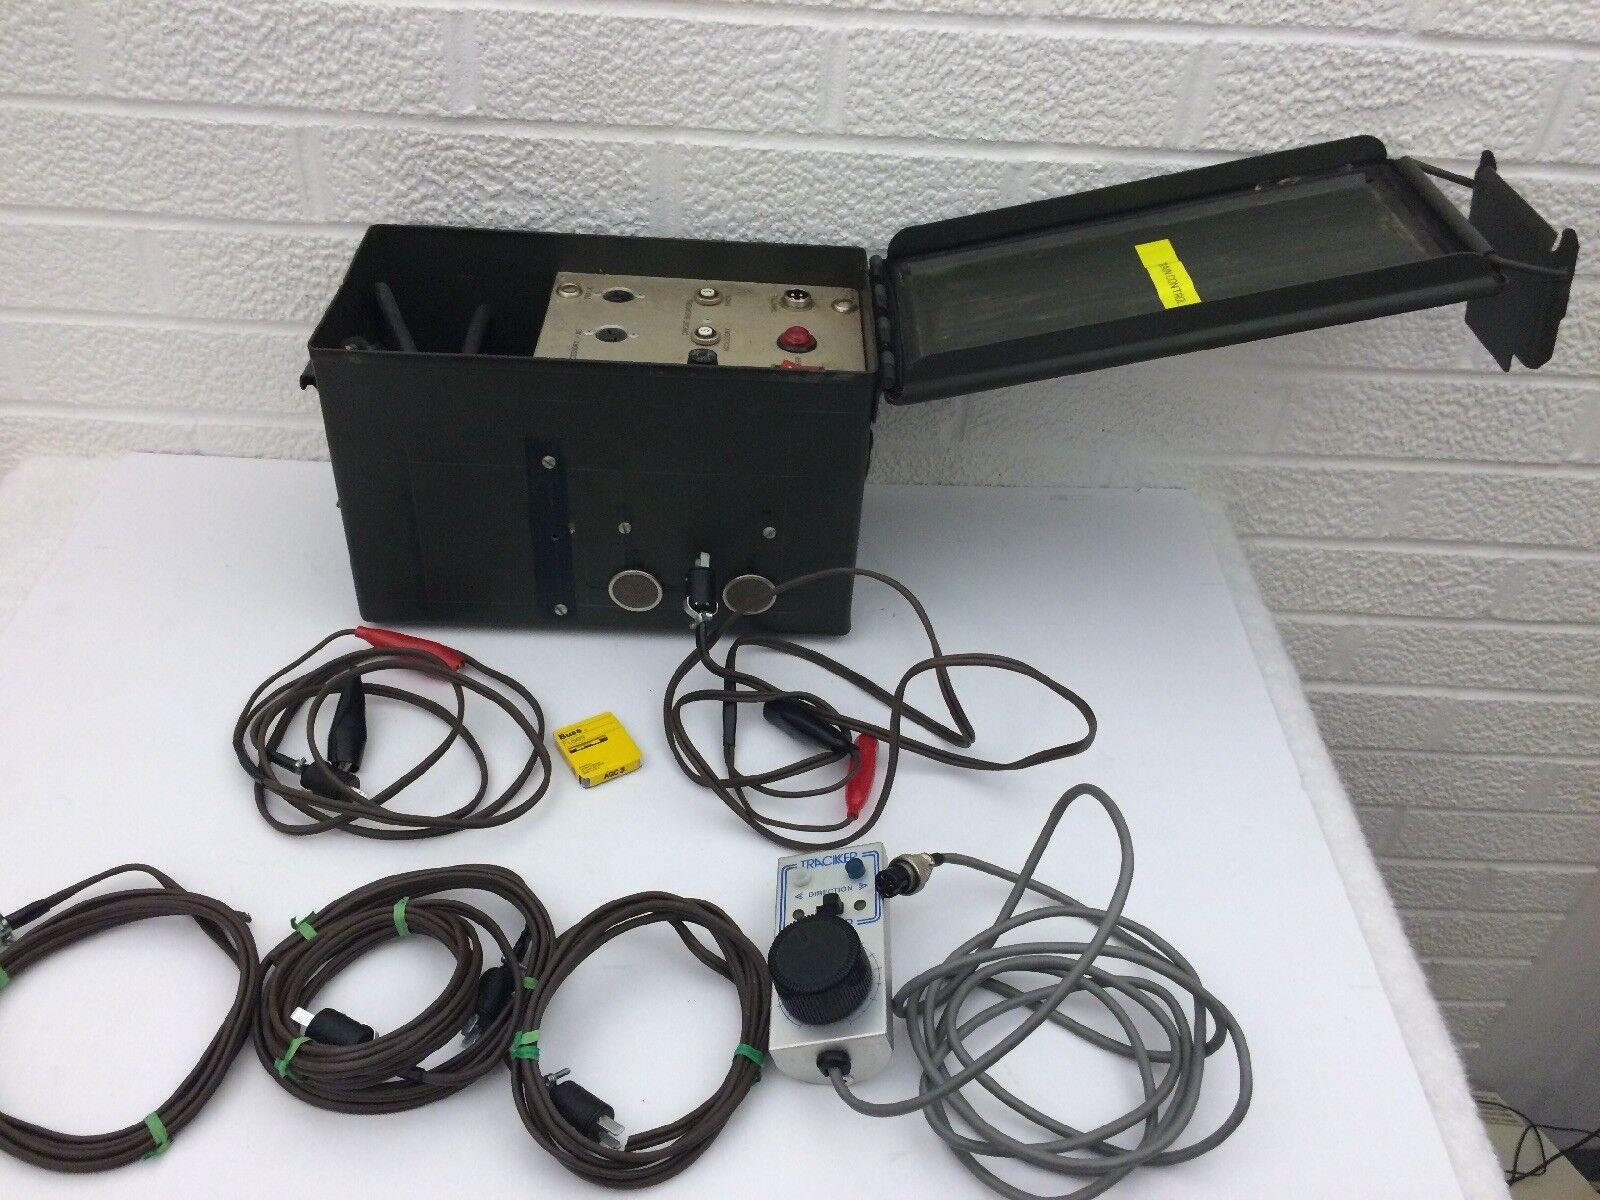 Controlador de tren Vintage Rastreador de mano por Troller Con Accesorios Ver Detalle